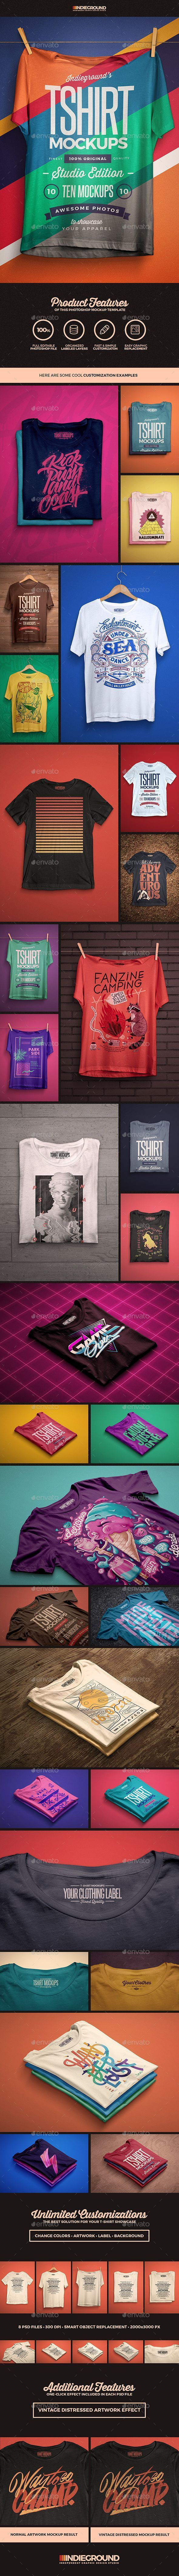 Shirt design generator online - 25 Best Ideas About T Shirt Graphic Design On Pinterest Online T Shirt Design Shirts Online And Typography Online